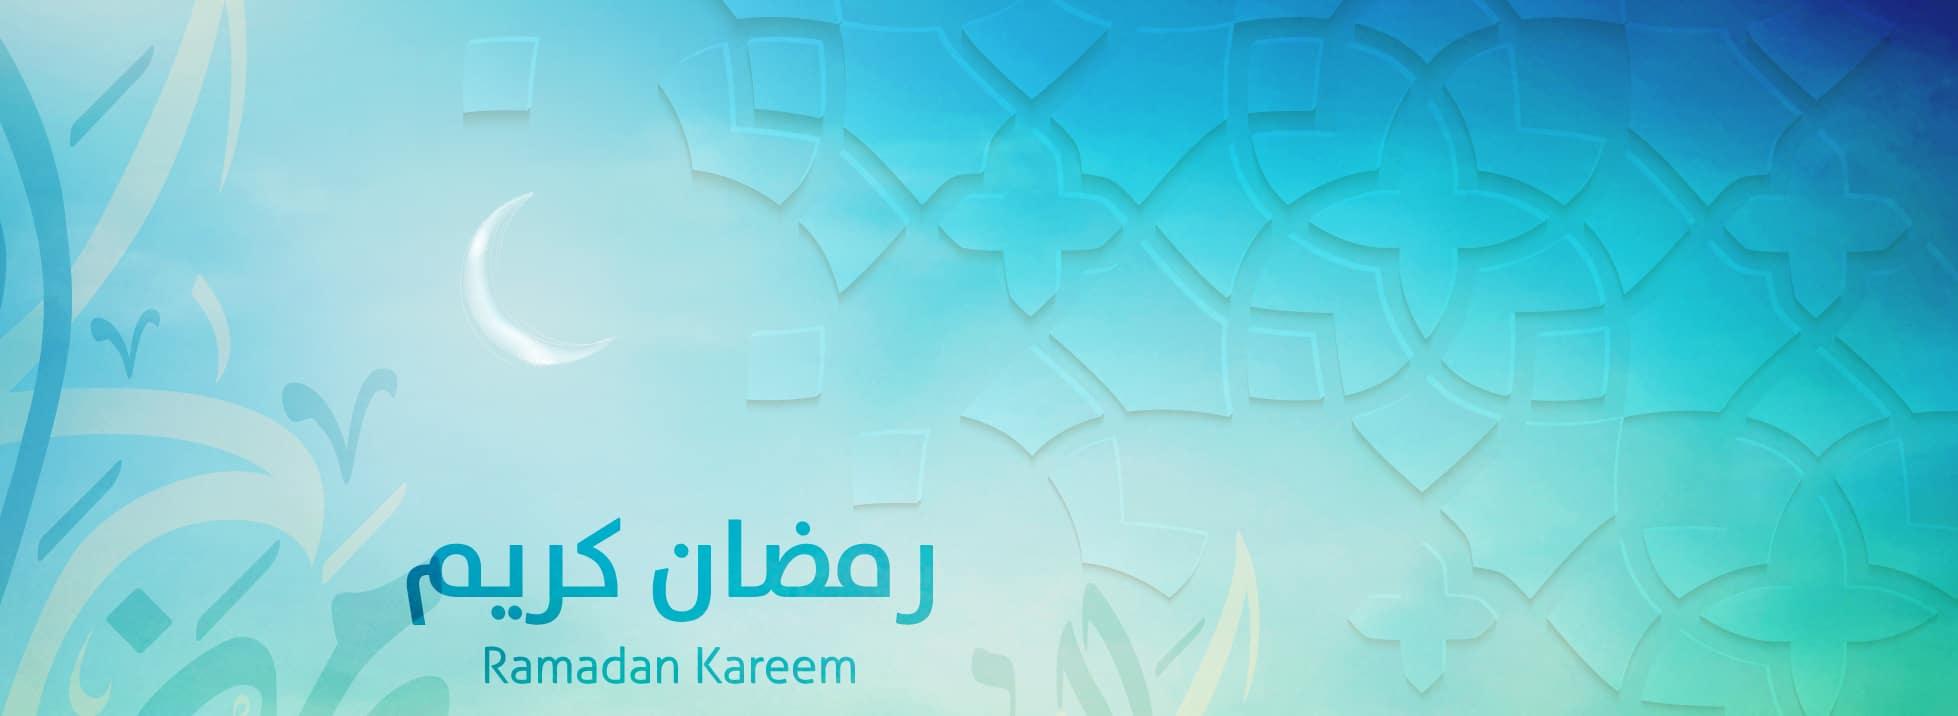 Ramadan 2021 slider